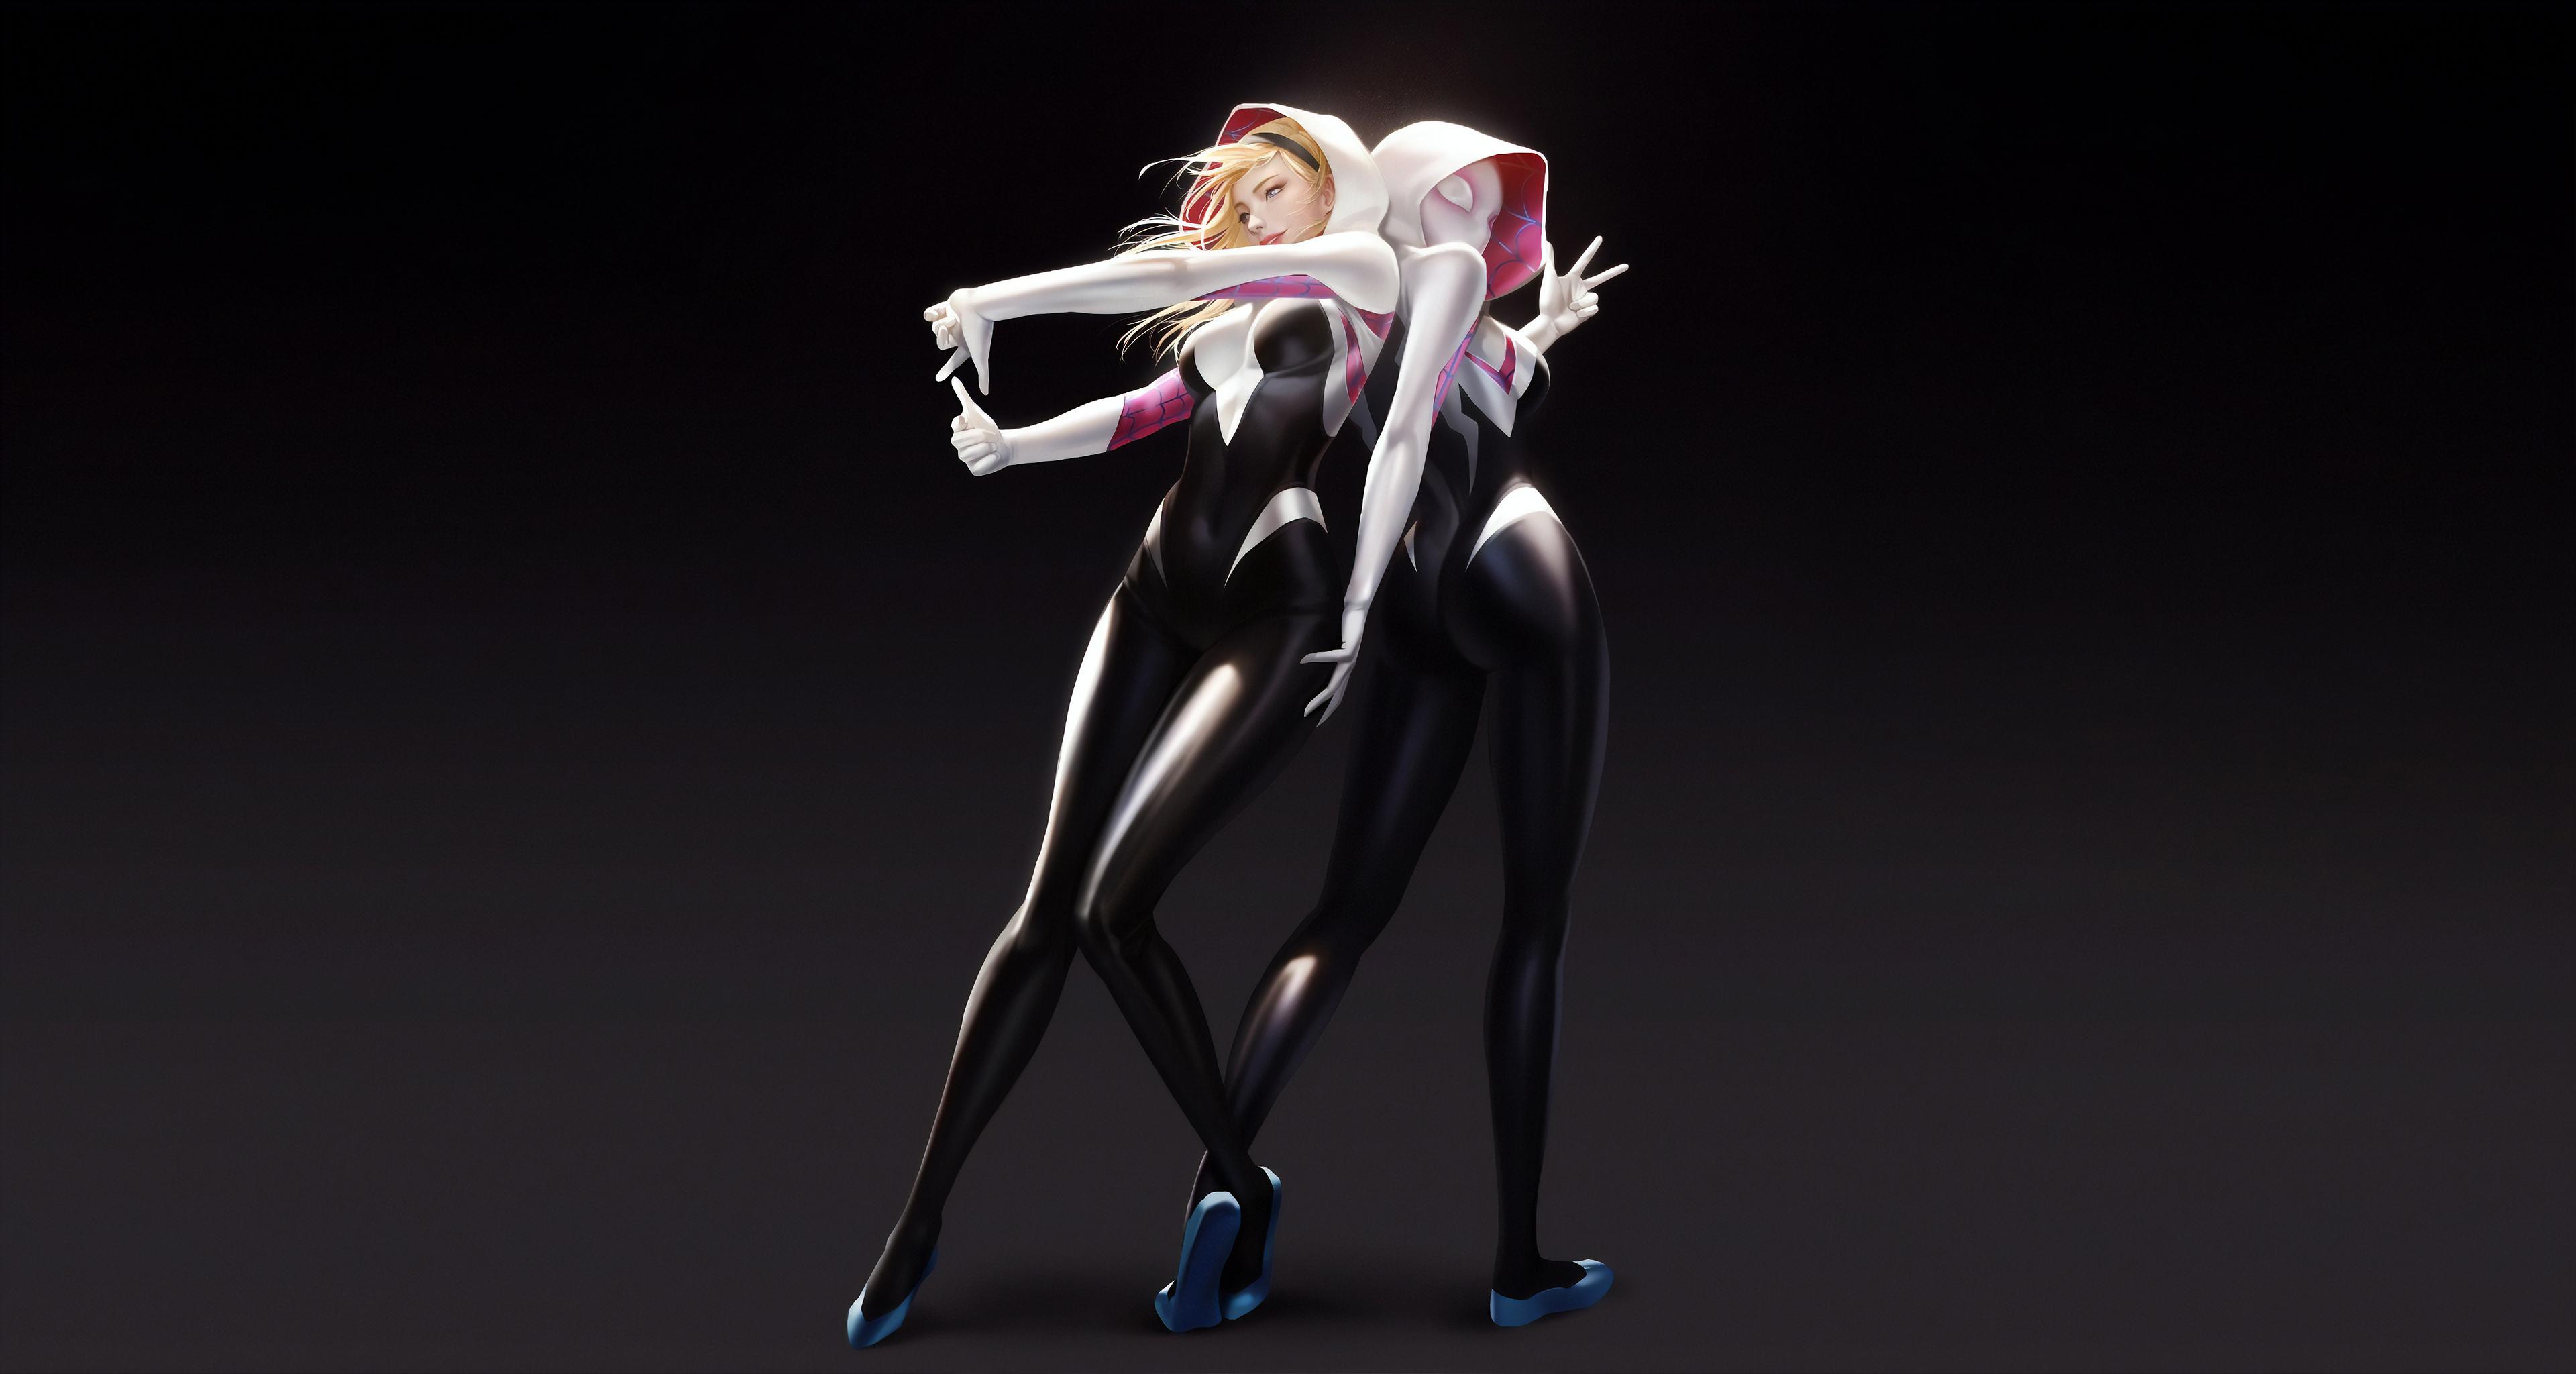 Gwen Stacy Spider Girl 4k, HD Superheroes, 4k Wallpapers ...